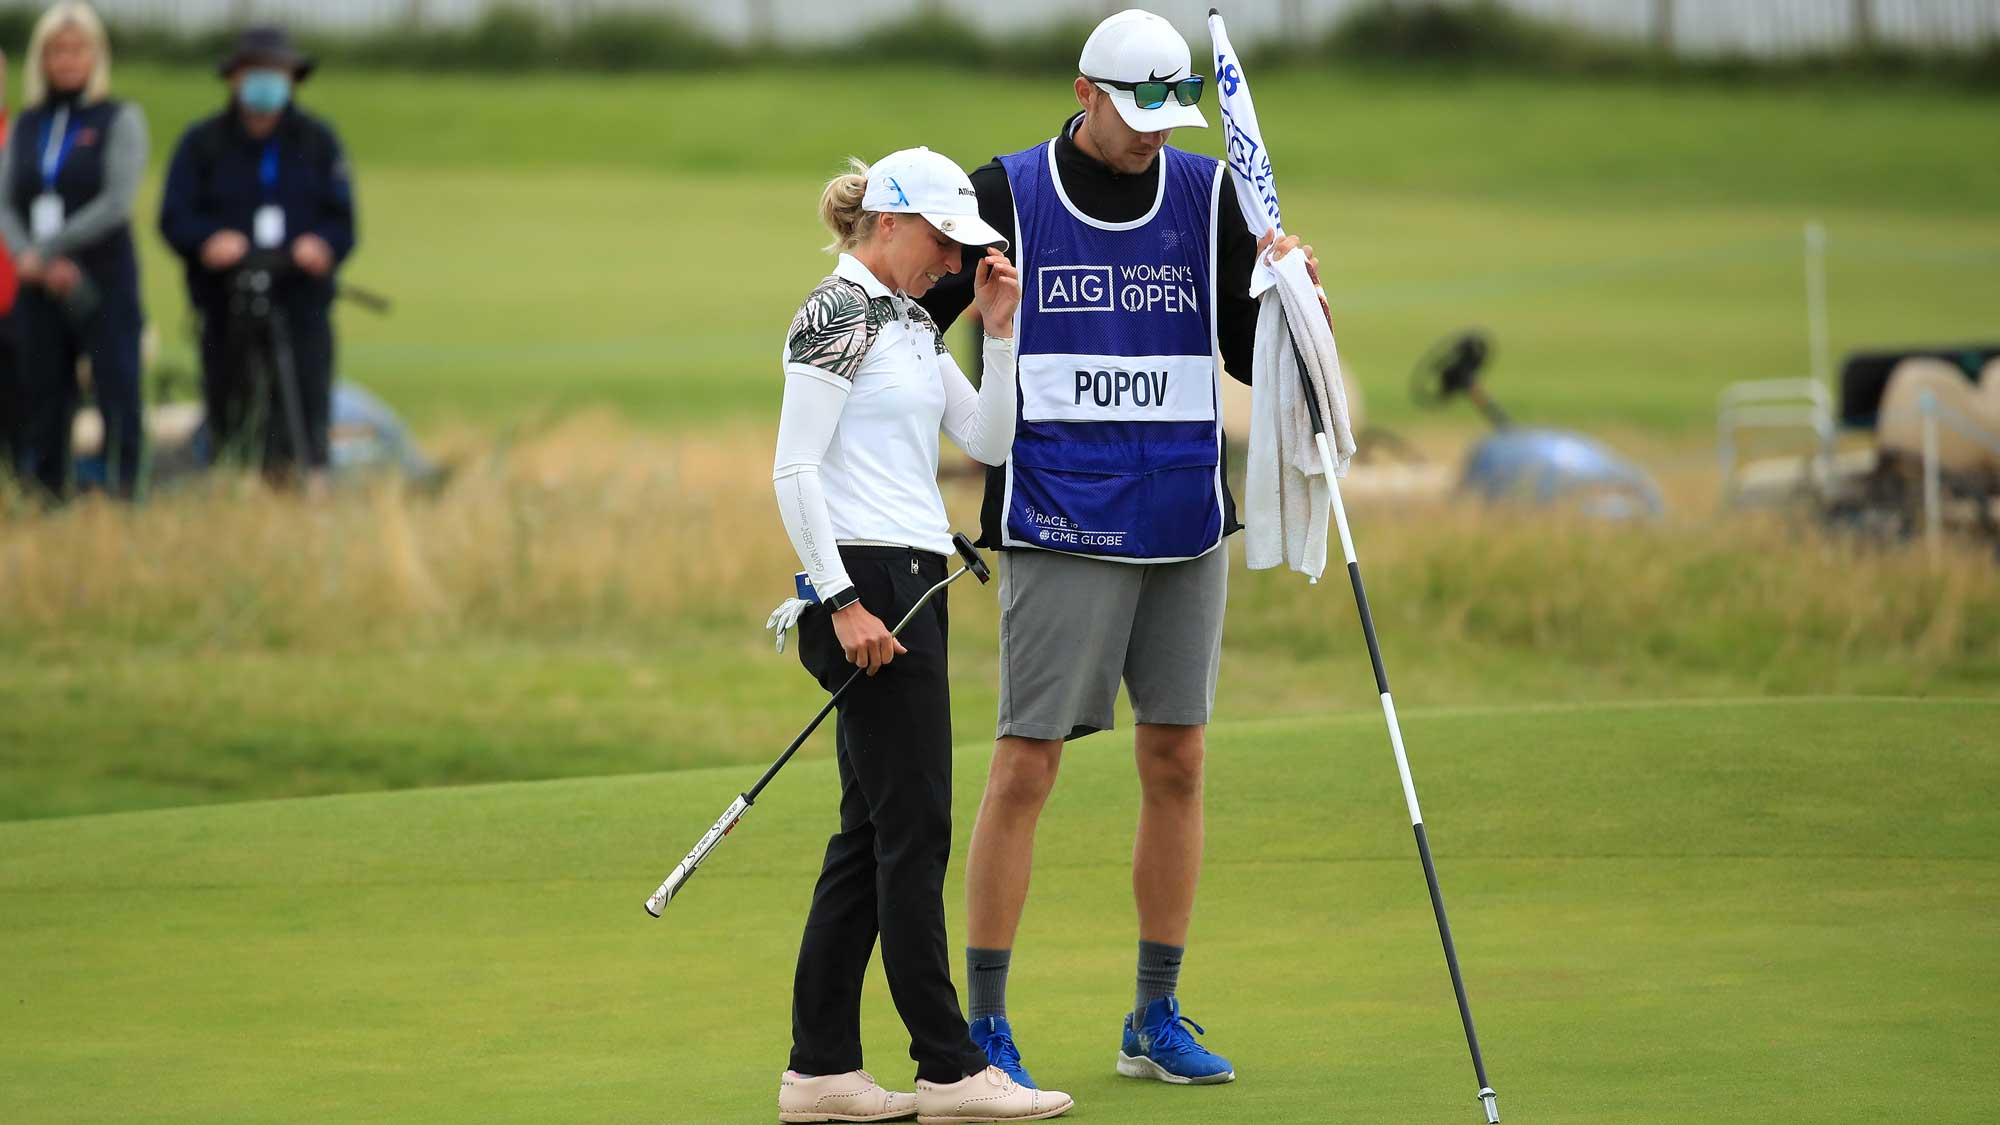 Popov Reveals Battle   LPGA   Ladies Professional Golf Association